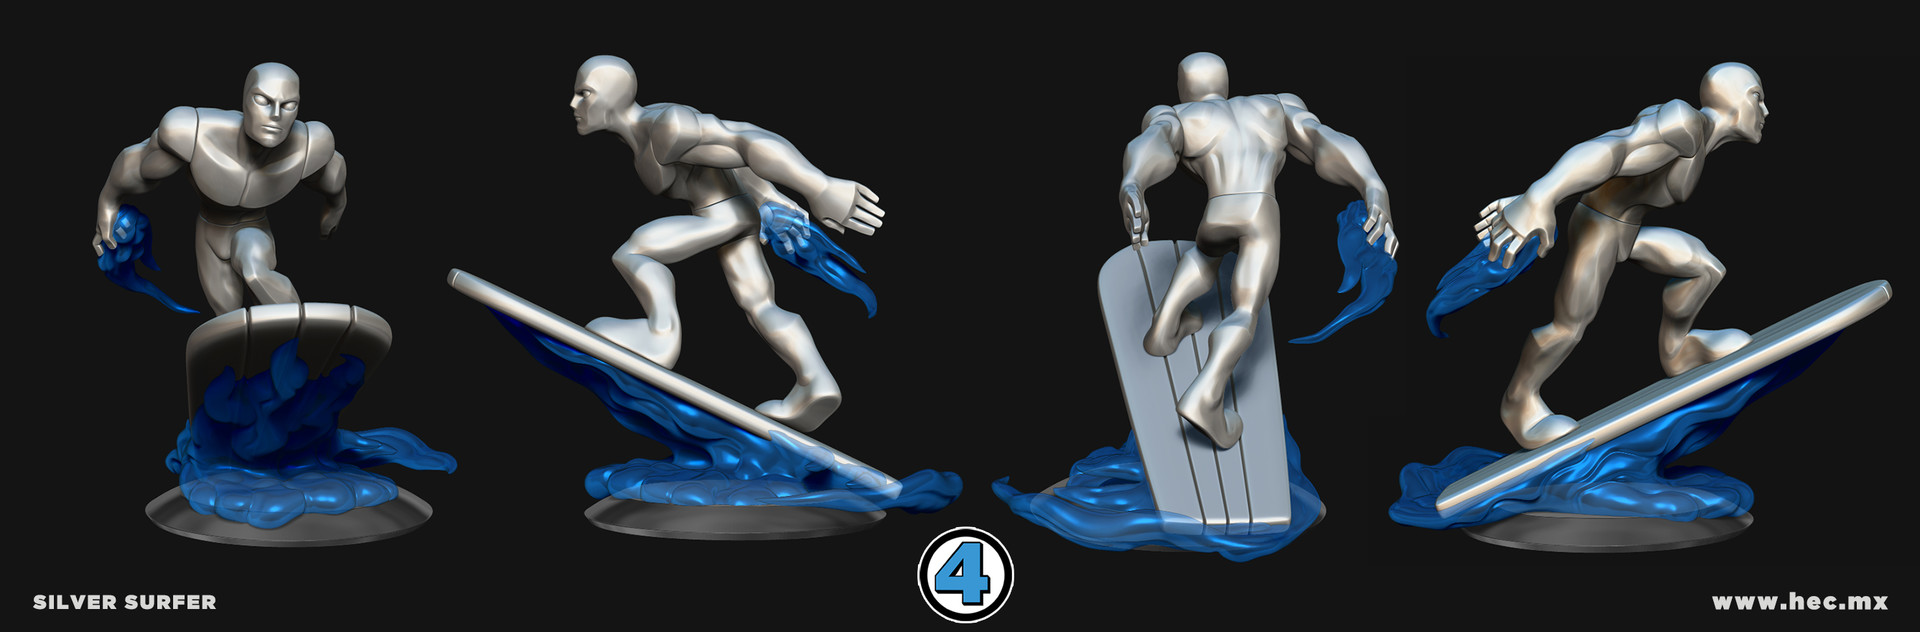 Hector moran hec surfer screens